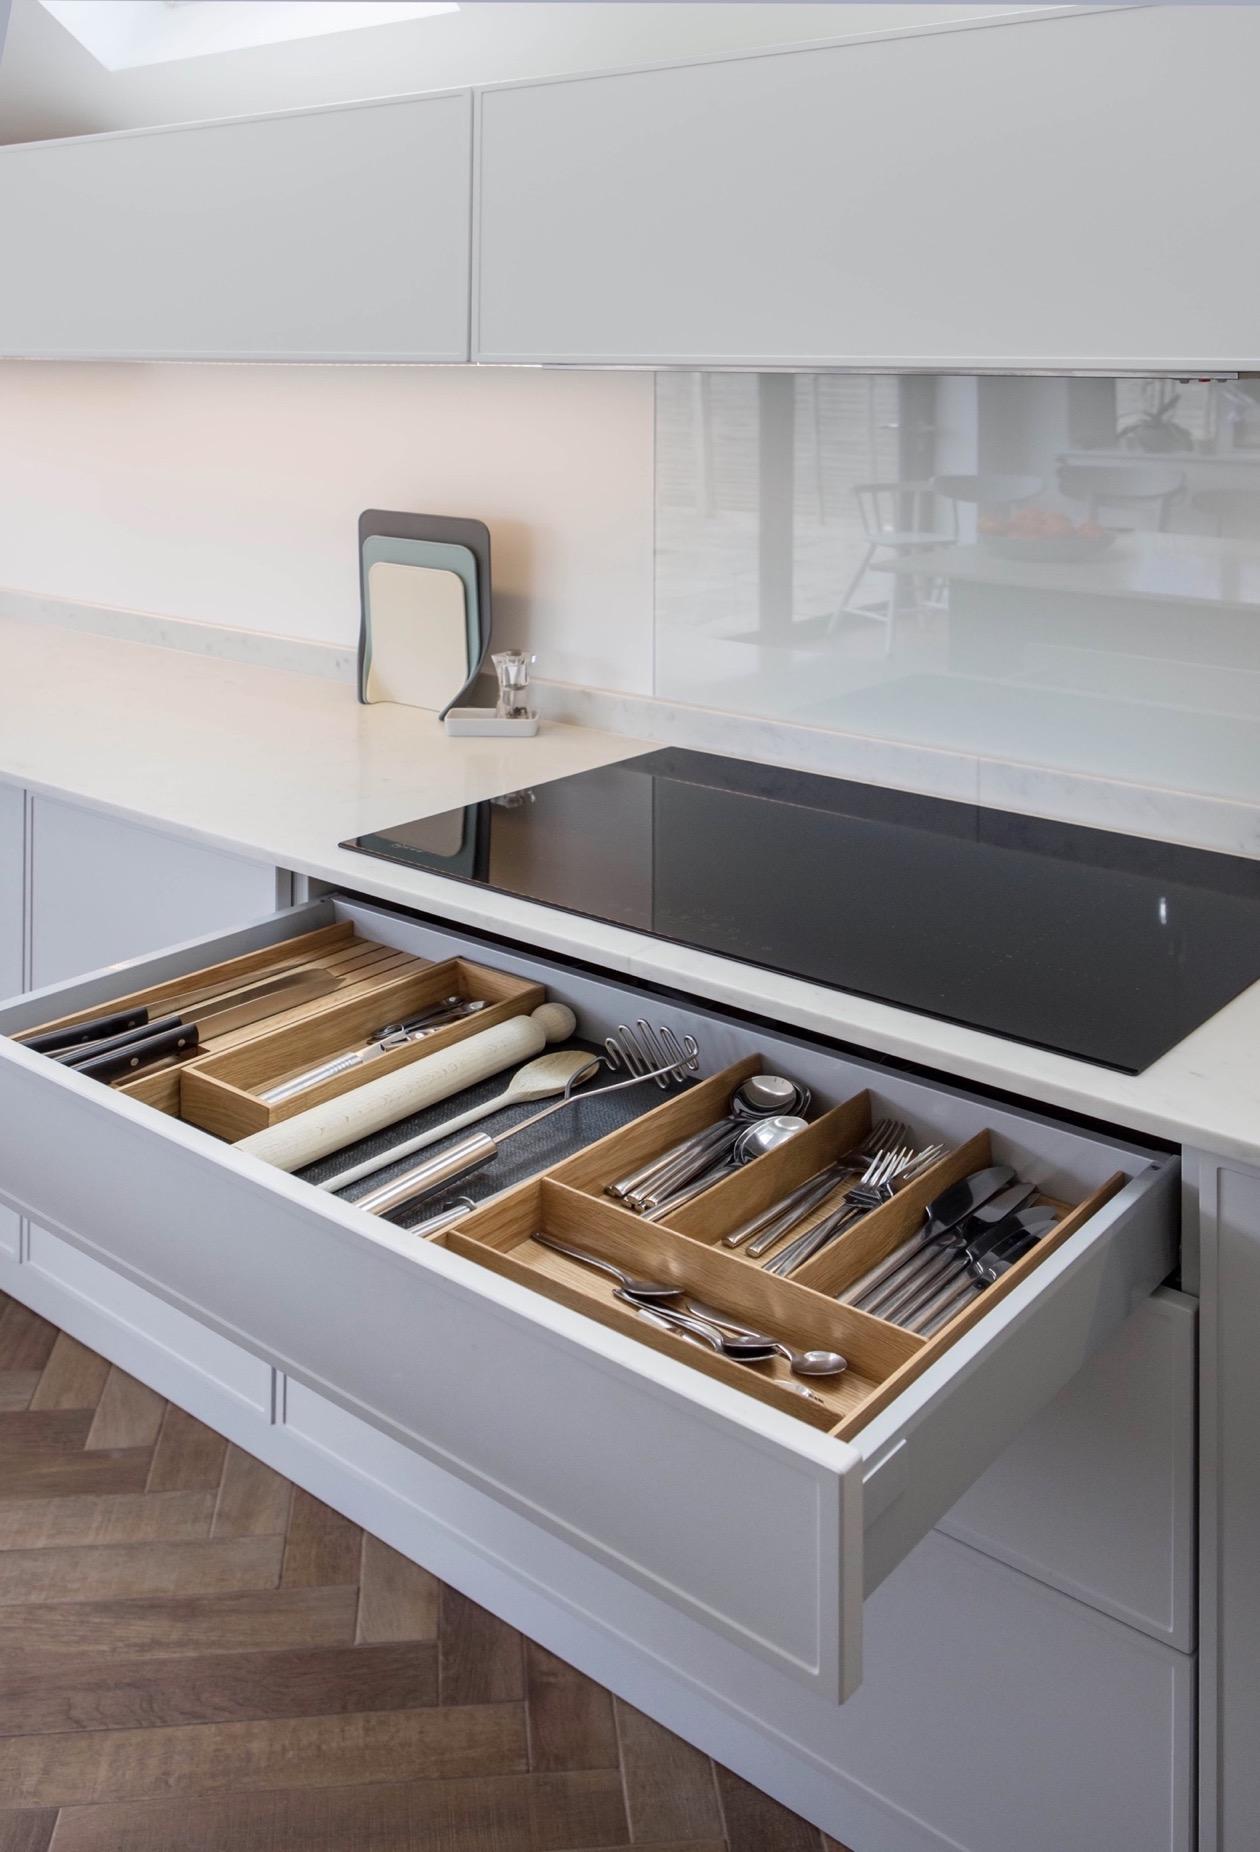 Oak cutlery utensil storage kitchen storage bespoke kitchen kingsey longwick thame bucks 3